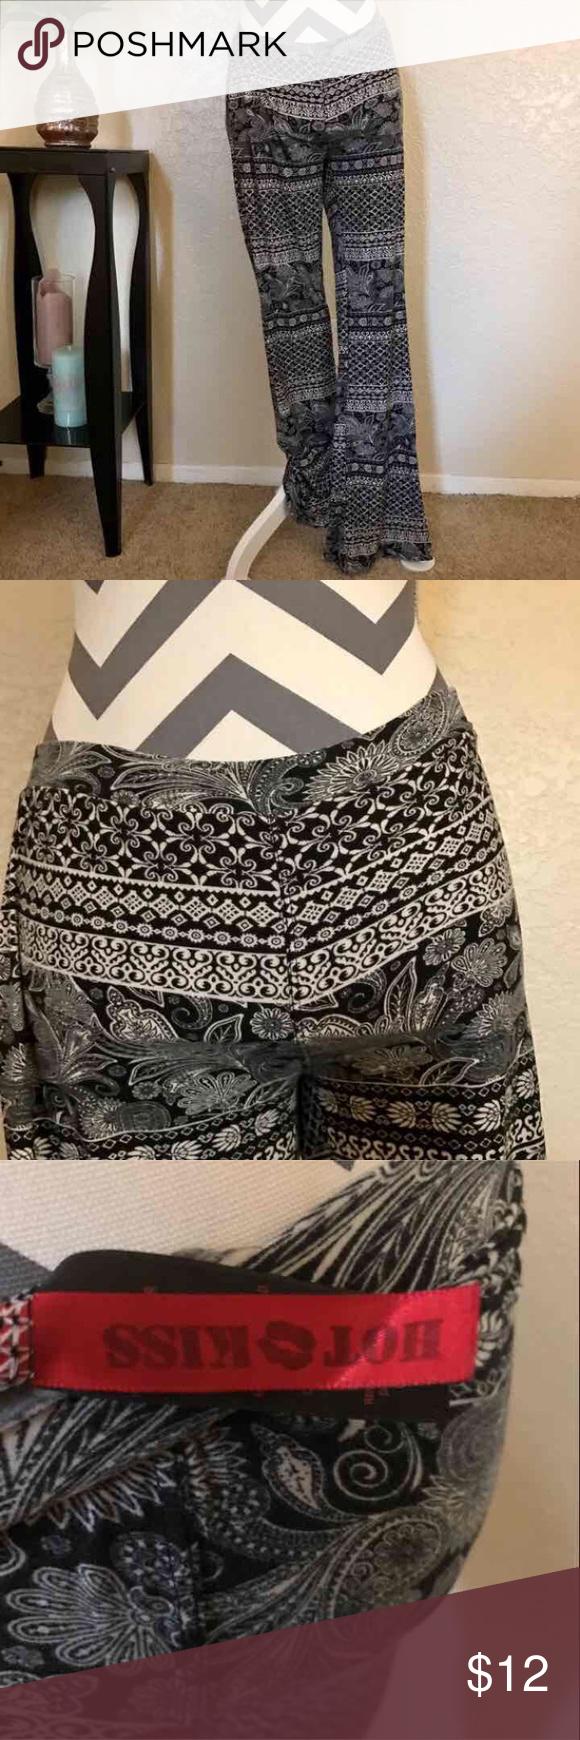 Hot 💋 Kiss palazzo pants S Super comfy Hot Kiss 💋 palazzo pants. Nice flare 😉 💕 great Pre-loved condition 💕pet/smoke free home Hot Kiss Pants Wide Leg